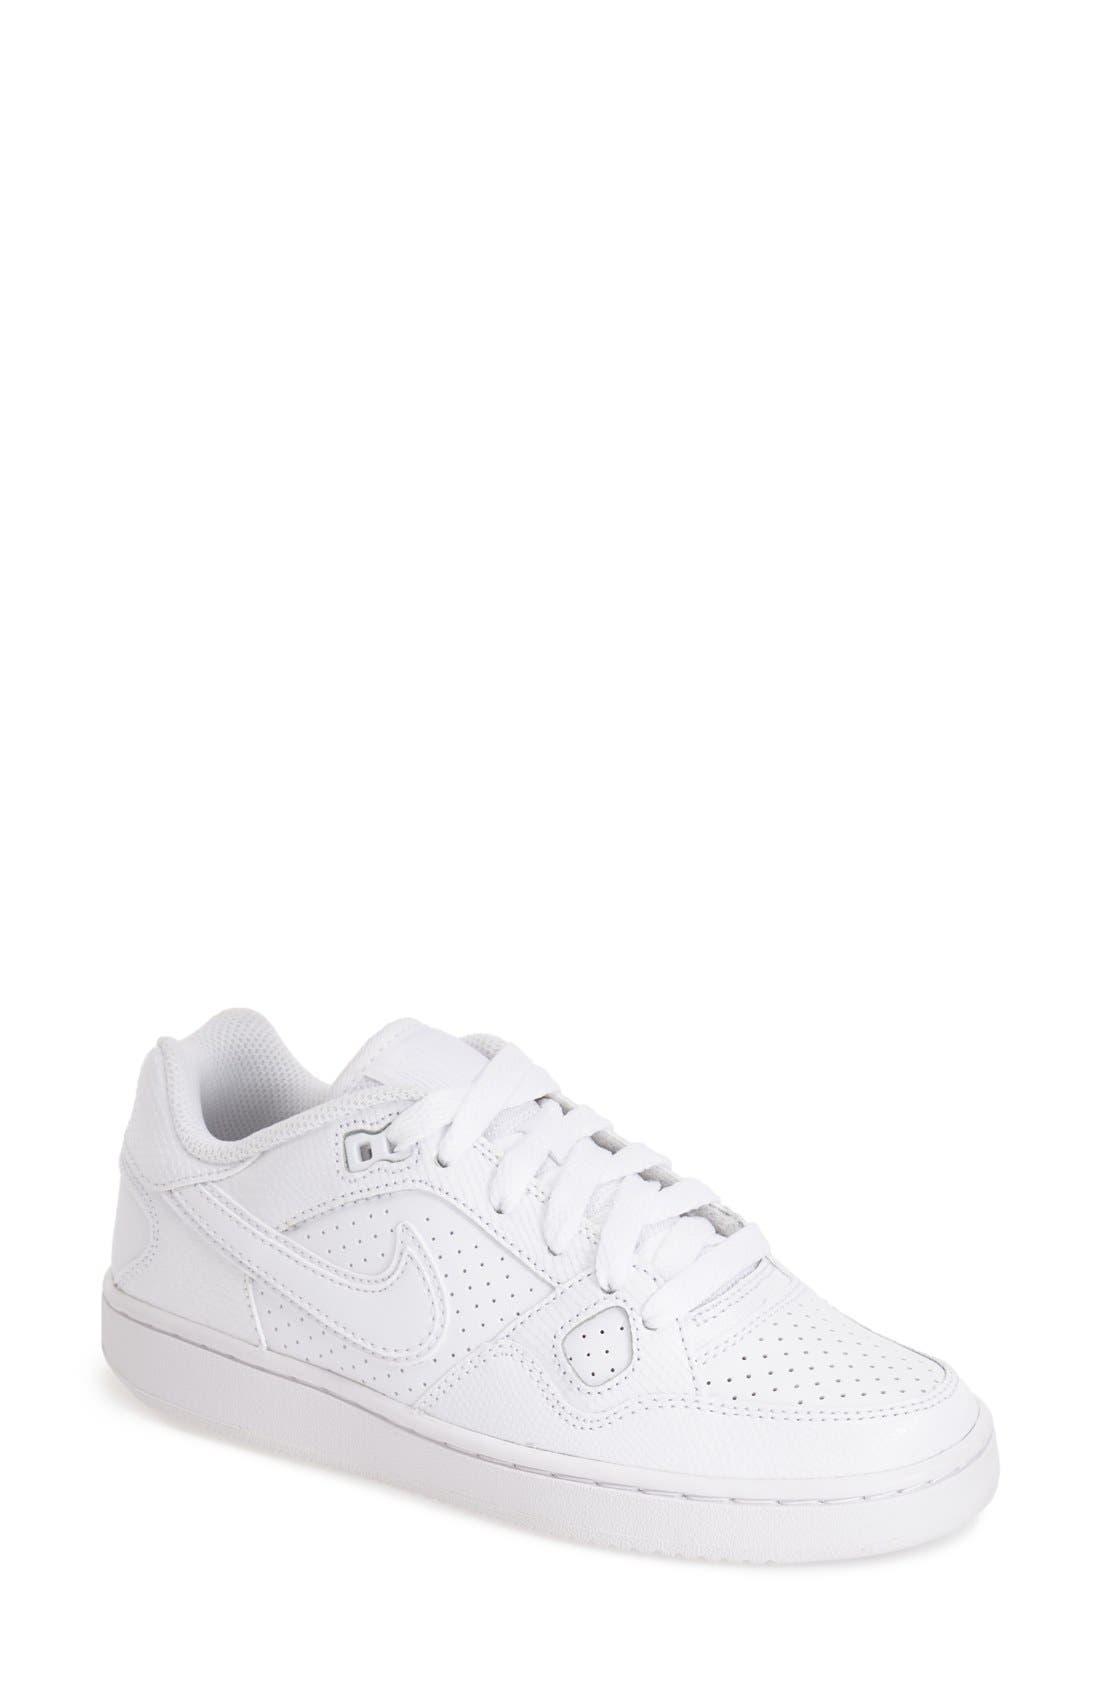 Main Image - Nike 'Son of Force' Sneaker (Women)